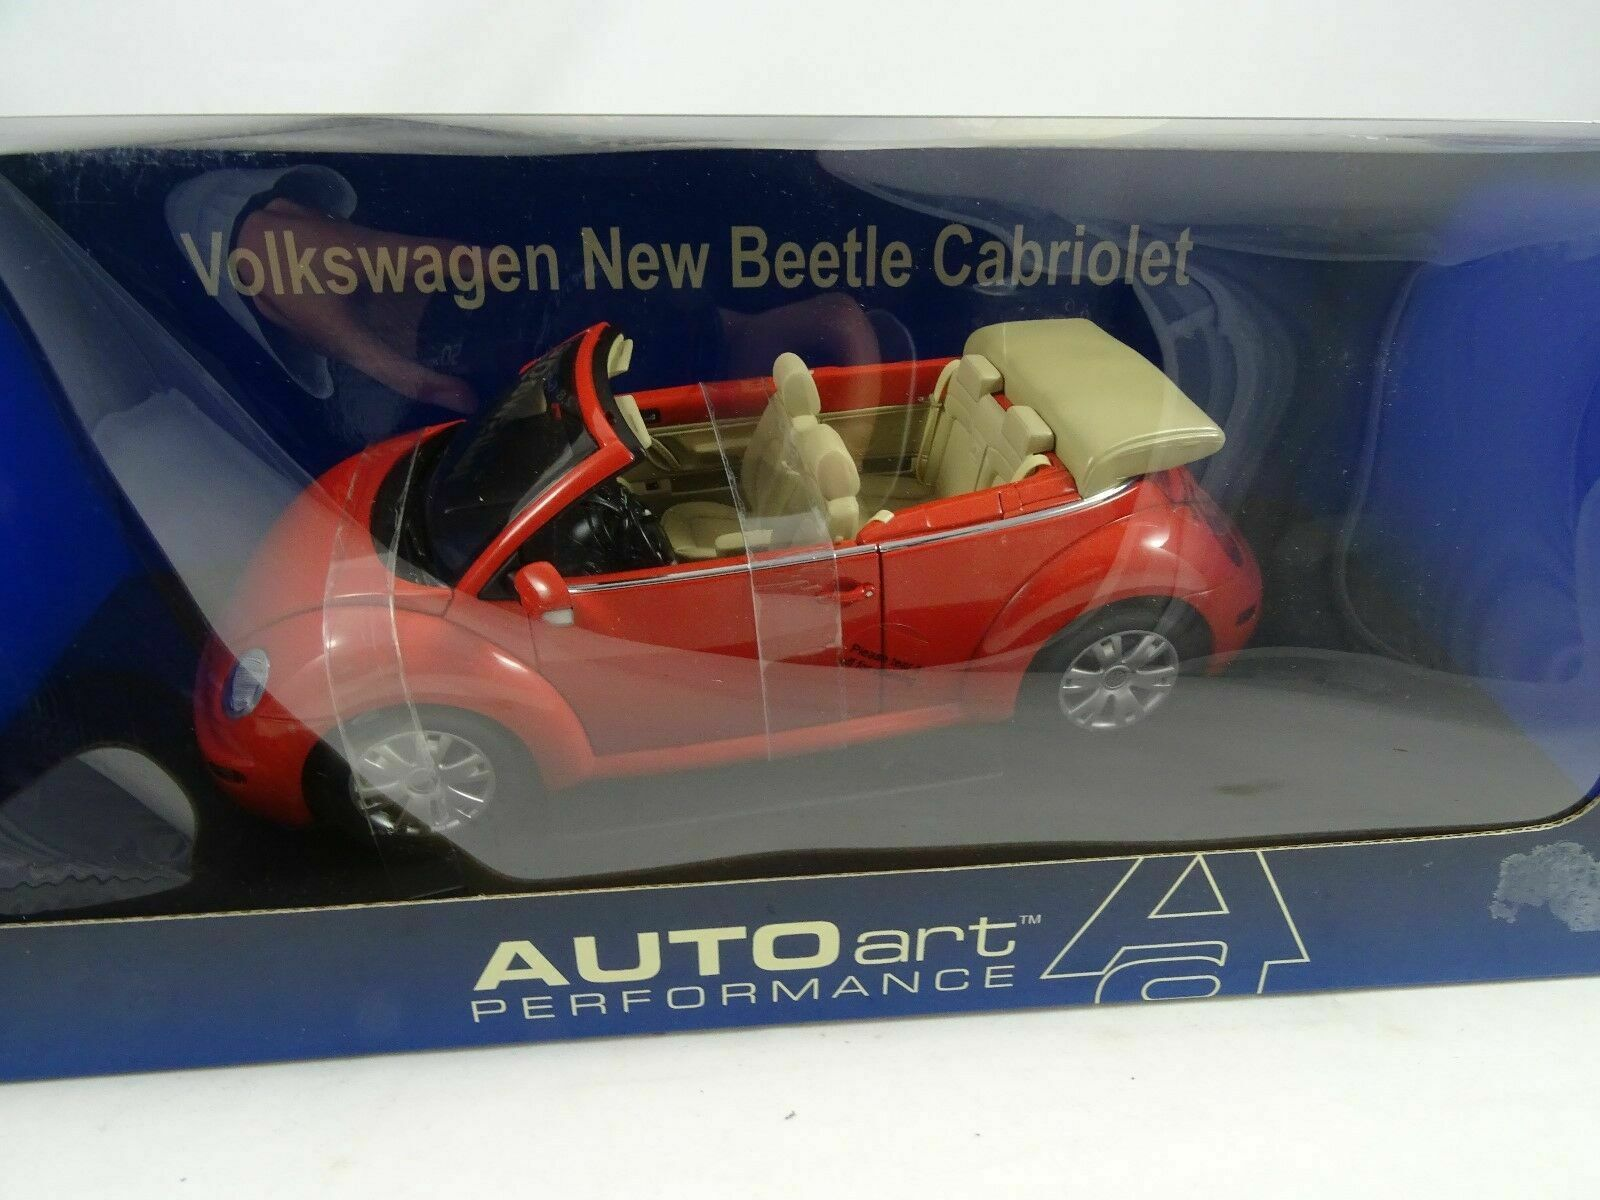 promociones de descuento 1 18 Autoart 79754 VW Volkswagen New Beetle Cabriolet Sundown Sundown Sundown naranja  salida